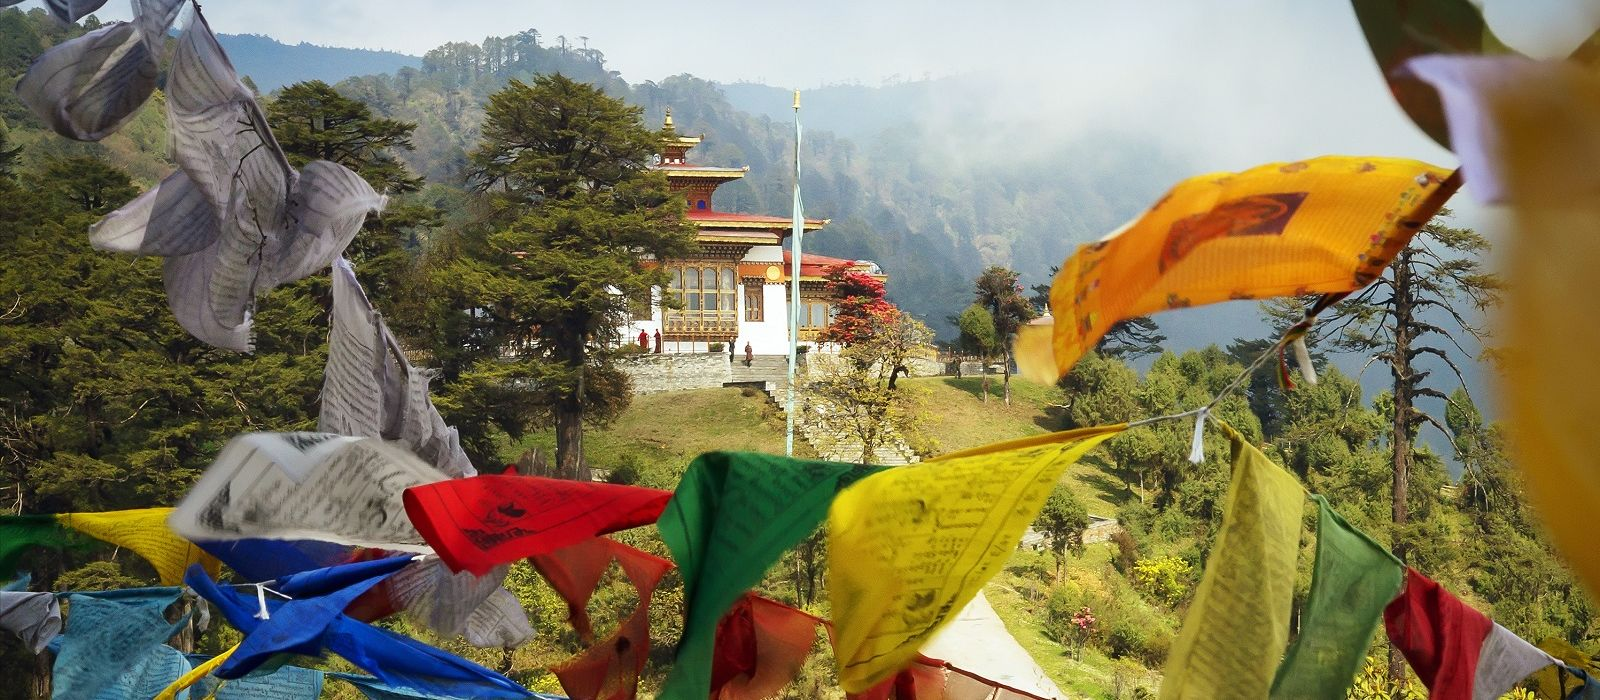 Landschaften, Luxus & Wellness in Asien Urlaub 5